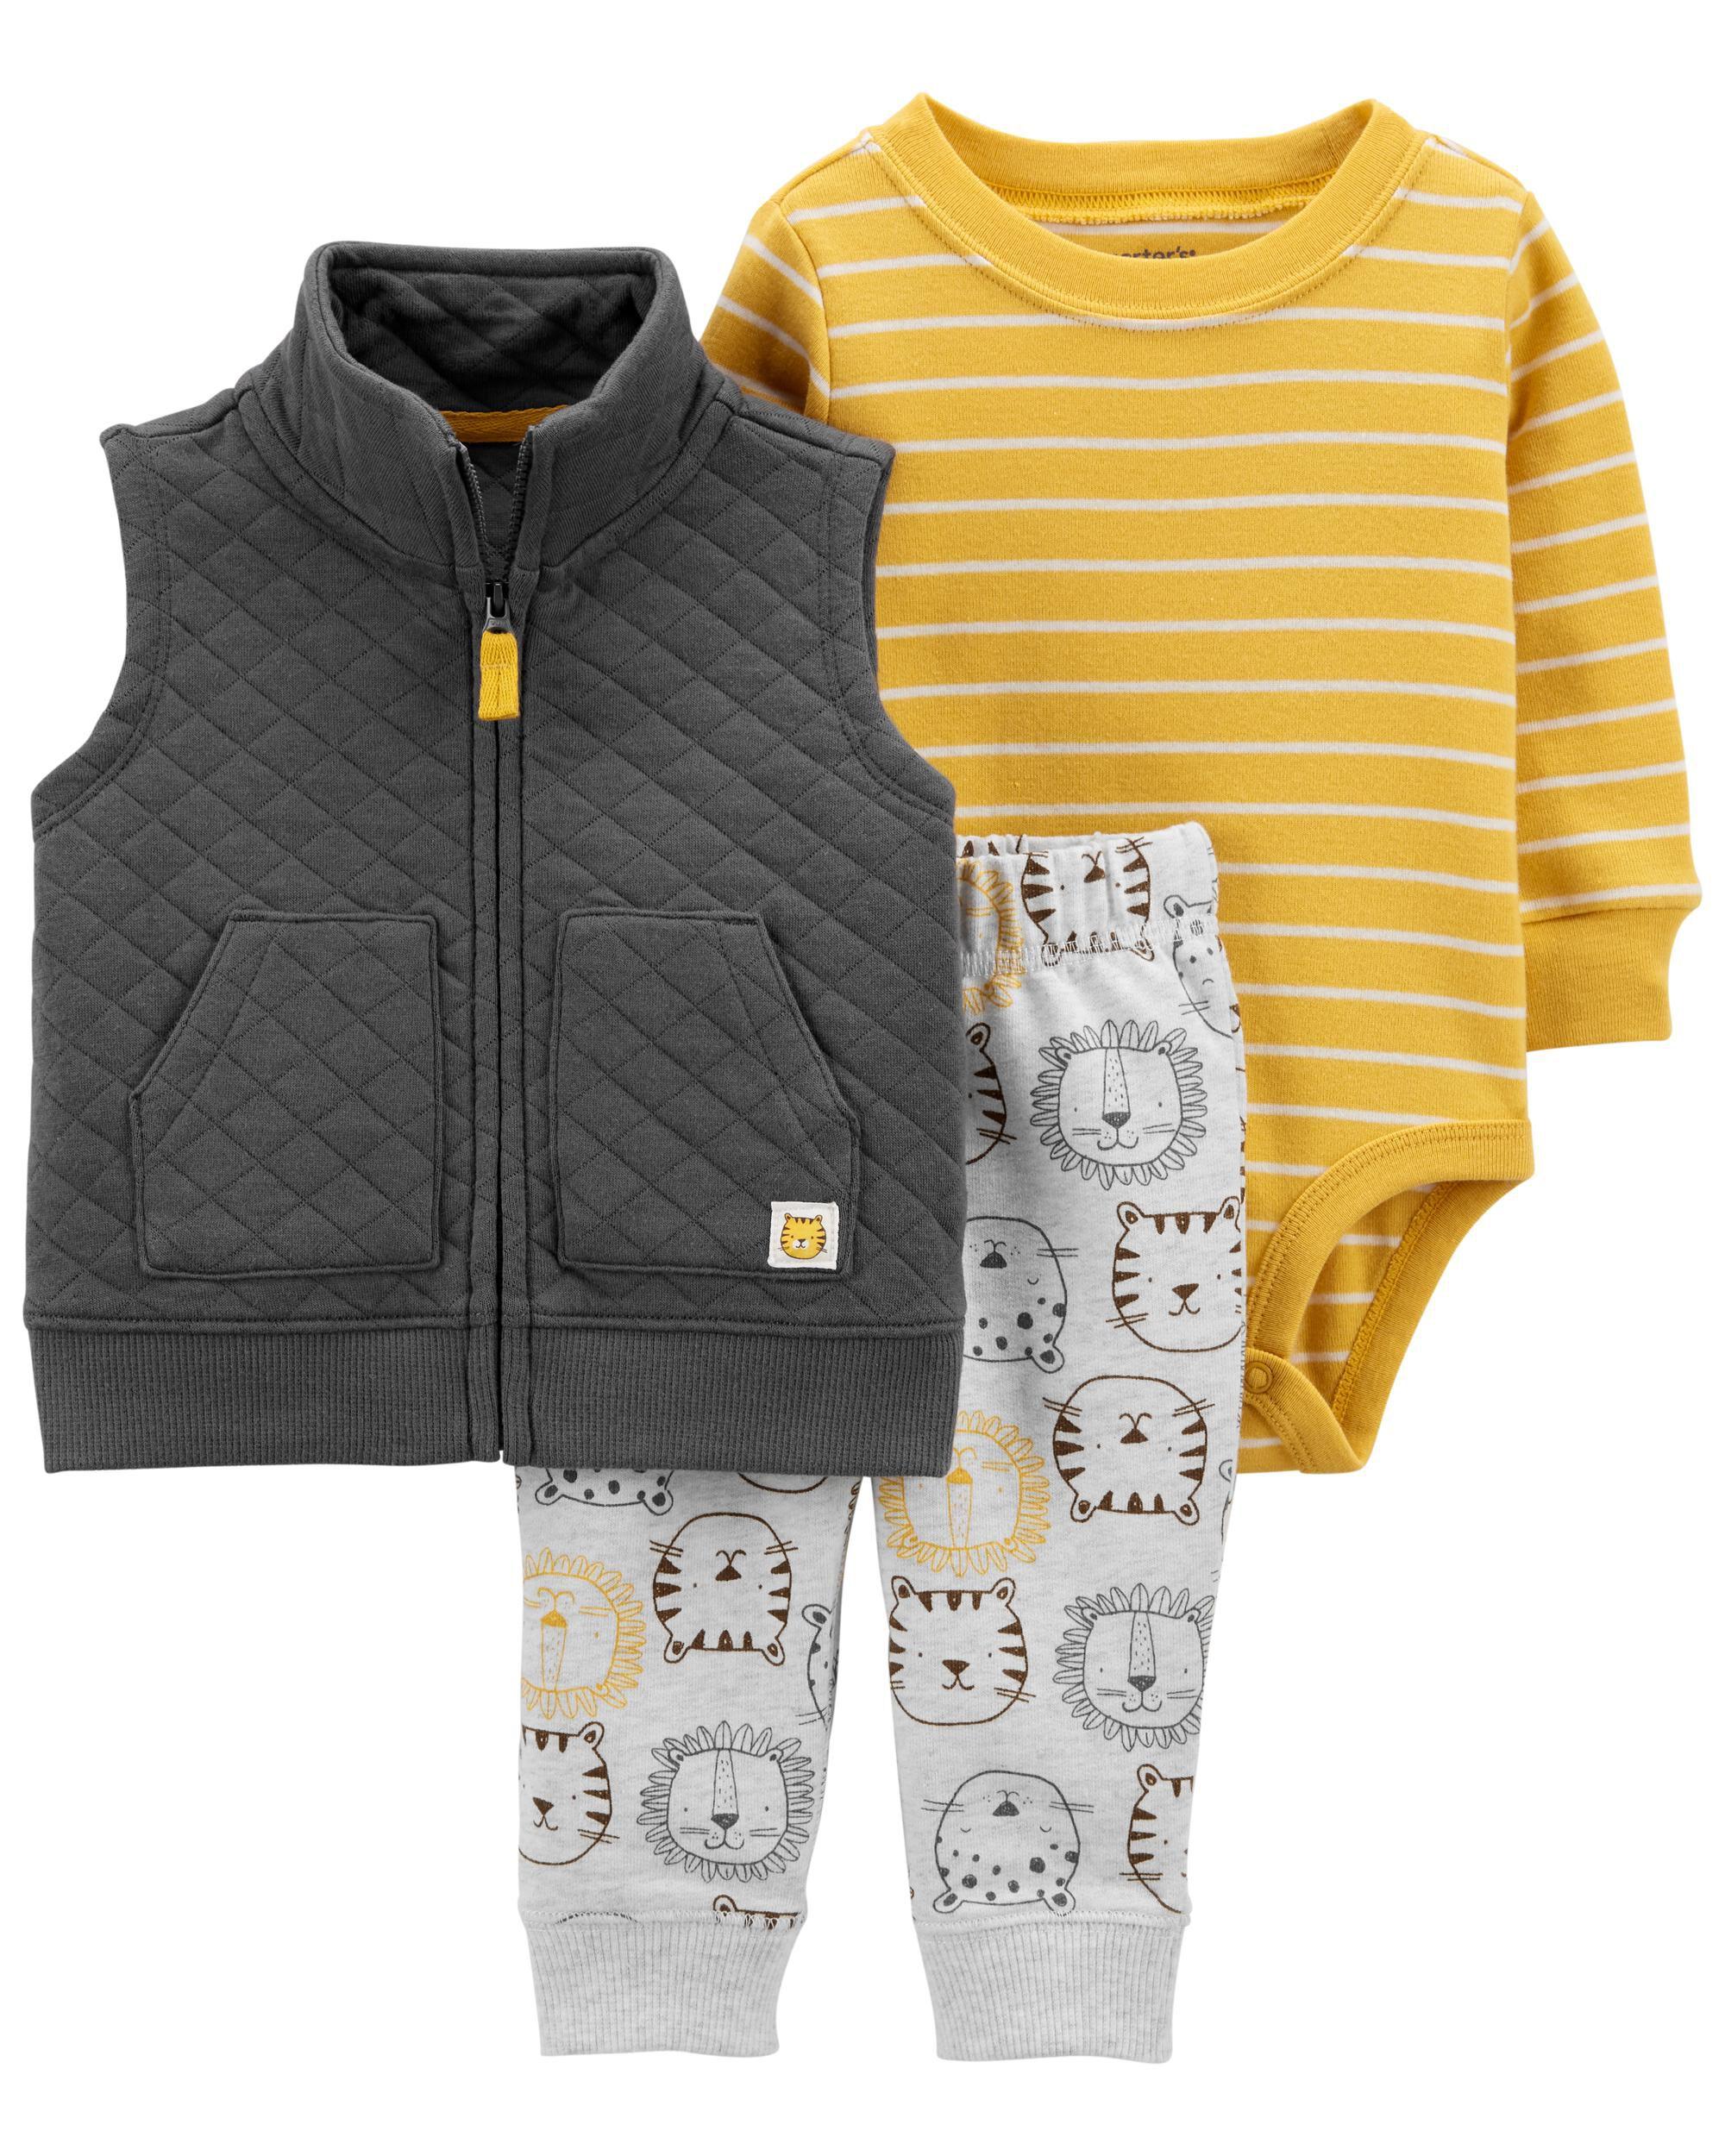 *DOORBUSTER* 3-Piece Lion Little Vest Set